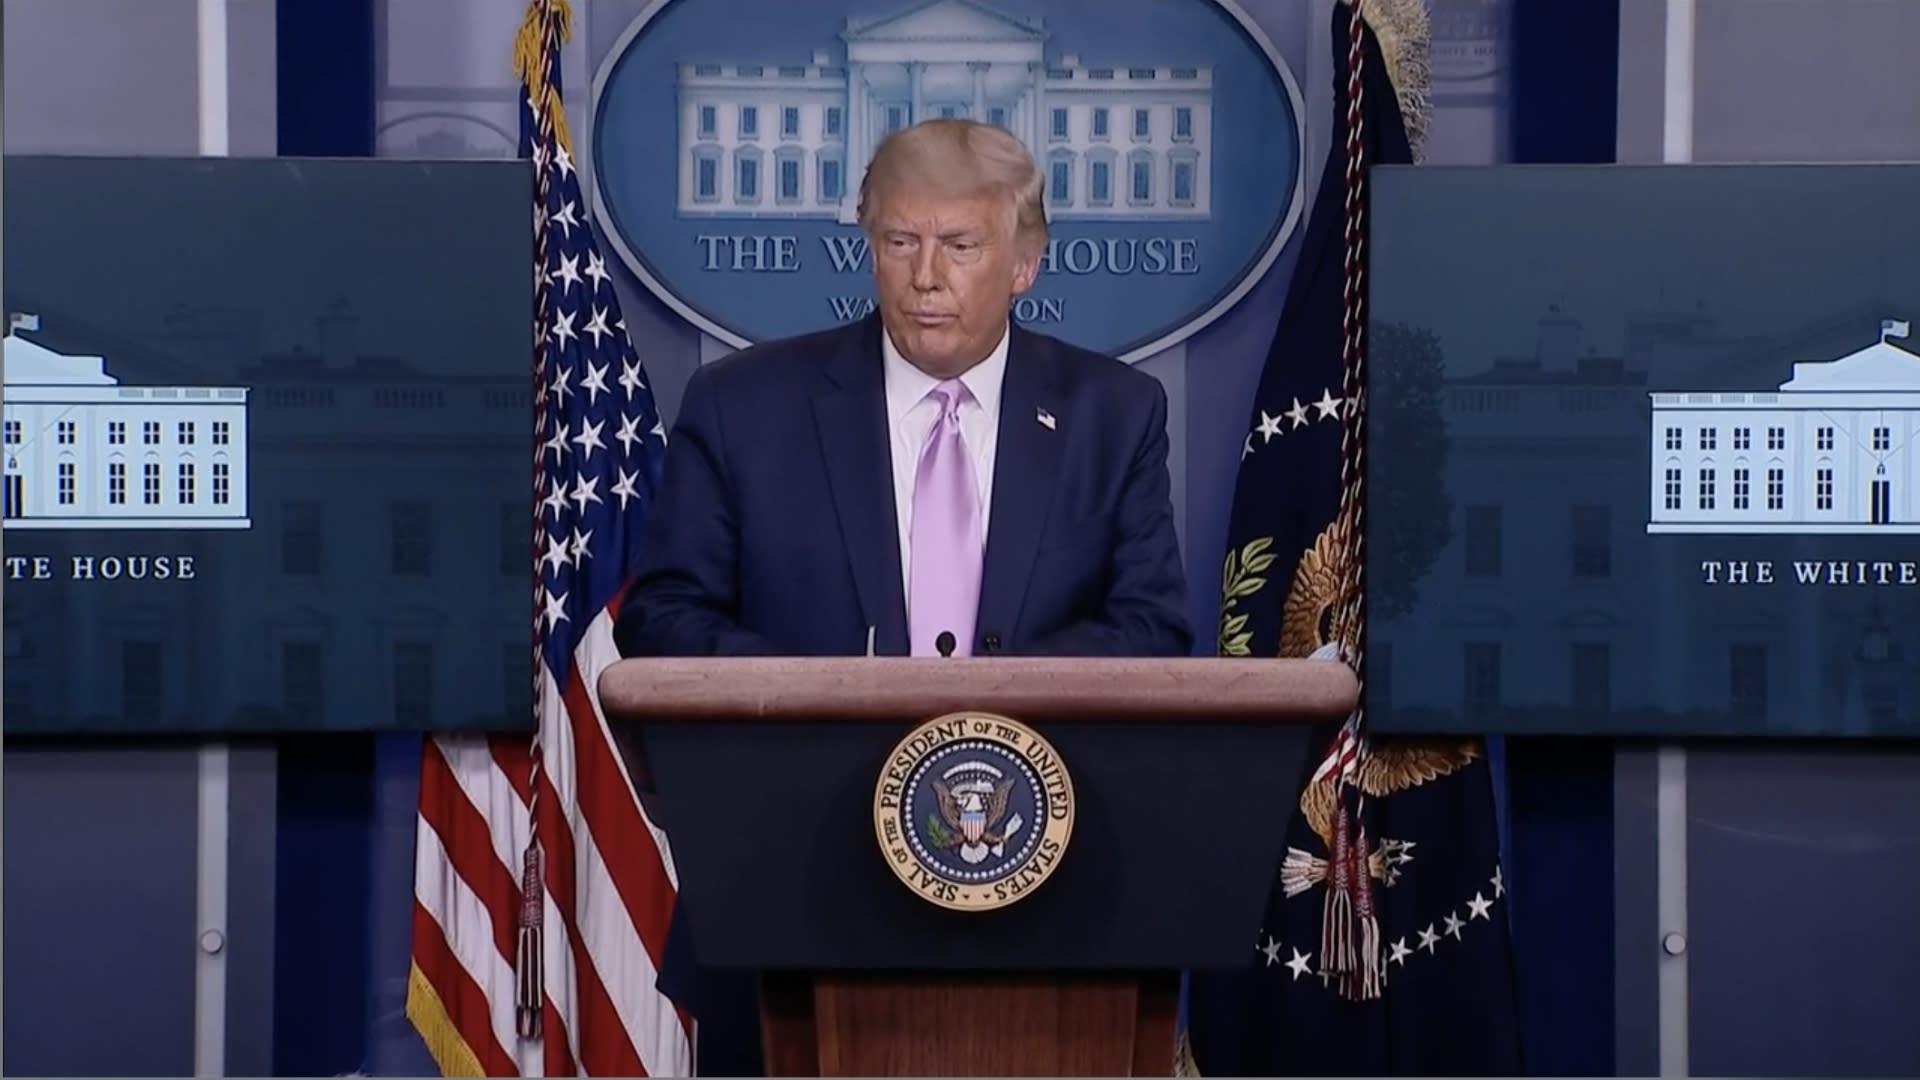 Trump says he 'appreciates' QAnon support Video